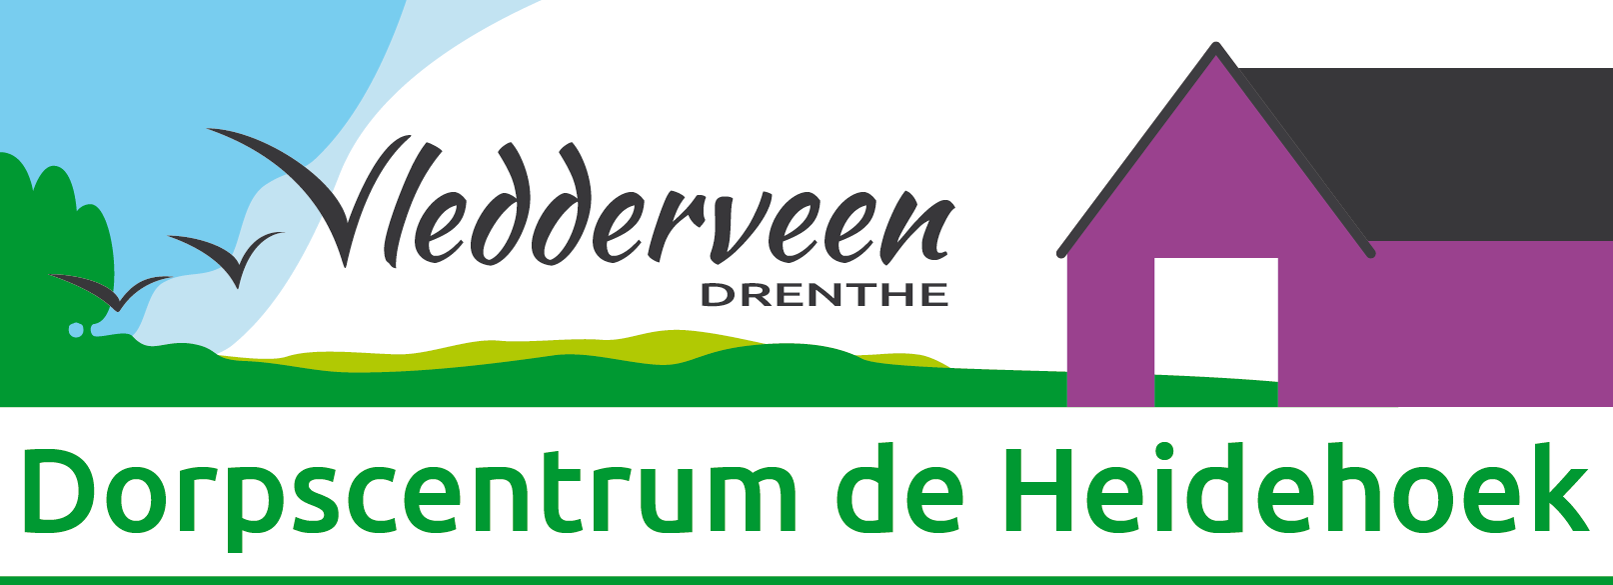 Mededeling van het stichtingsbestuur van Dorpshuis de Heidehoek 1